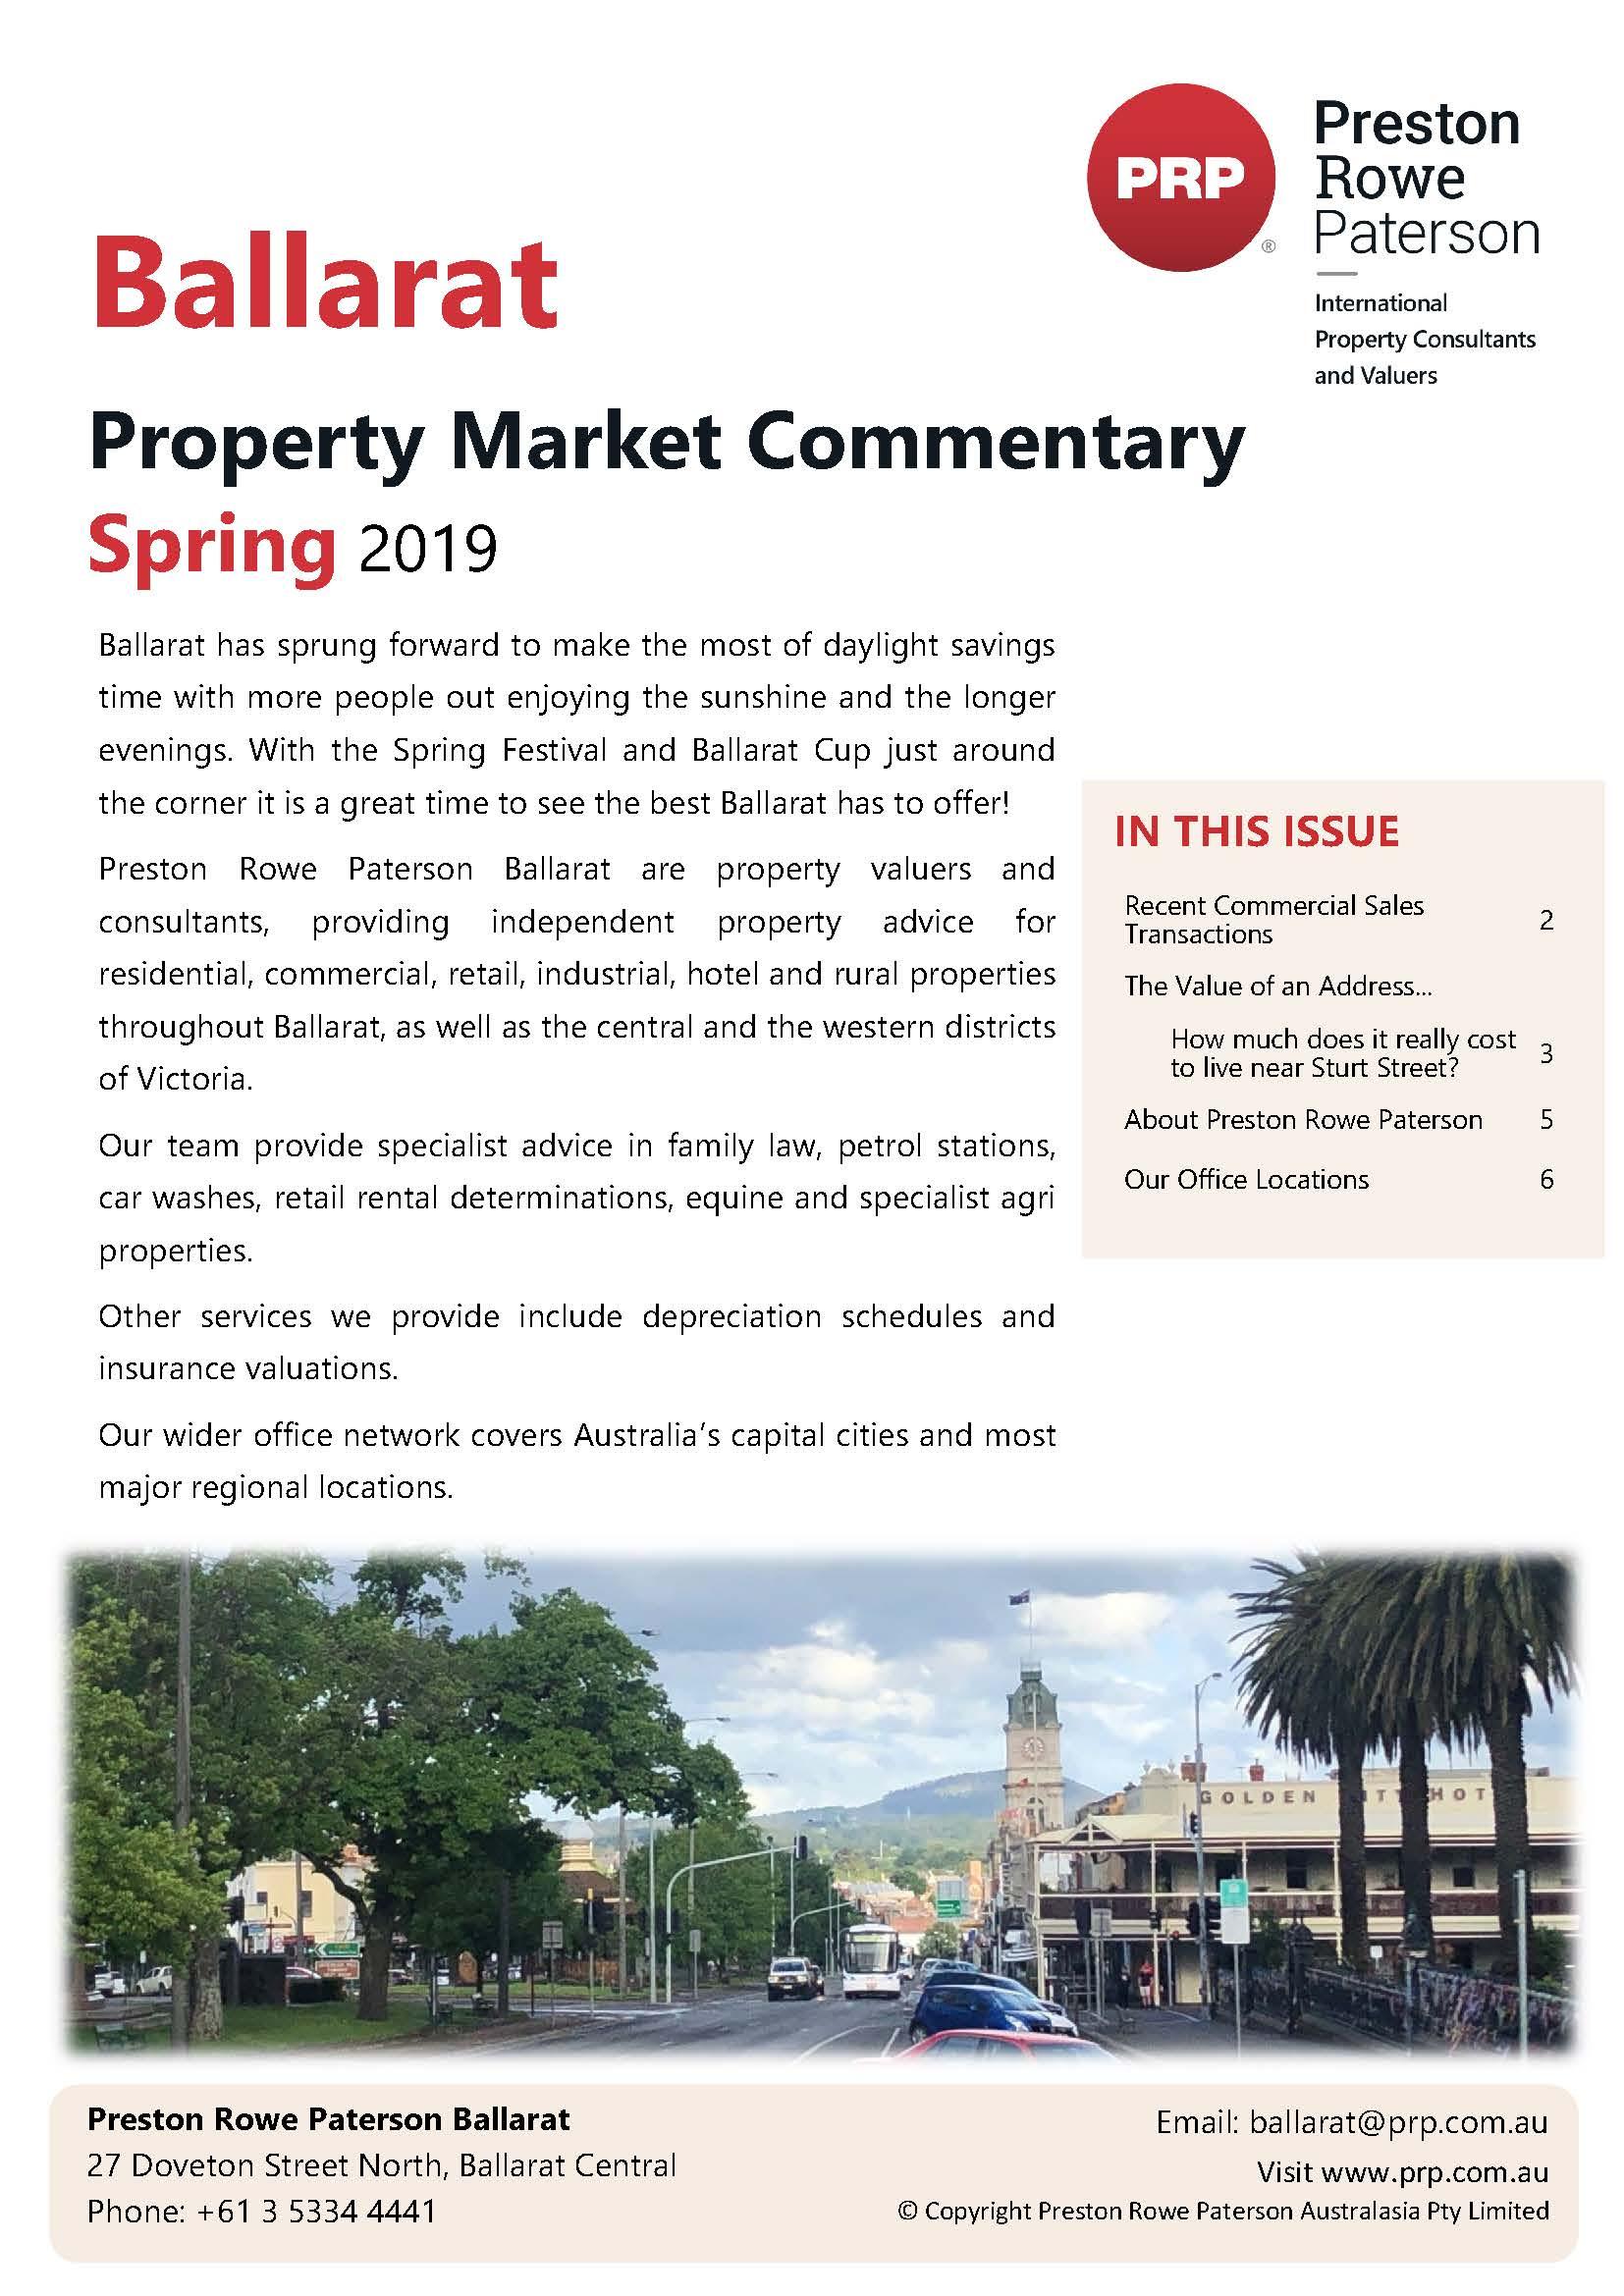 PRPs-Ballarat-Commentary-Spring-2019